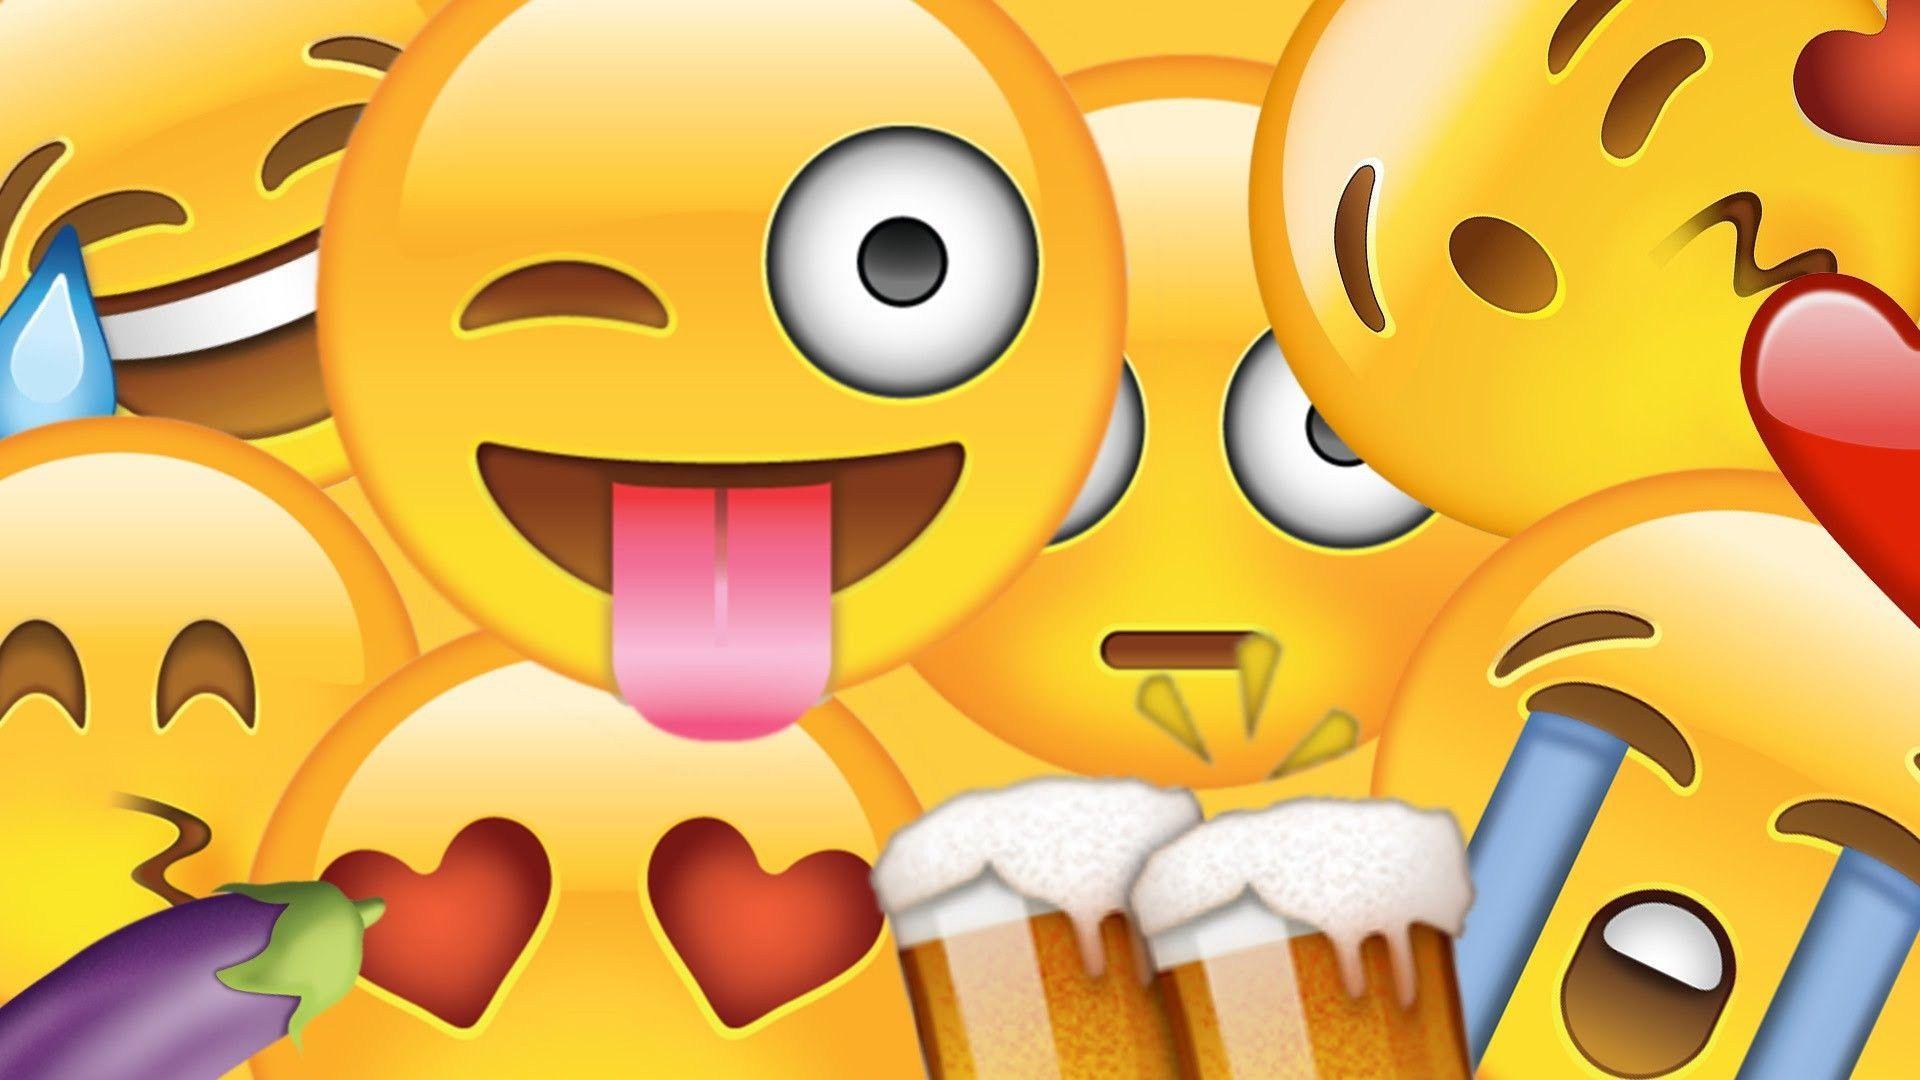 Emoji Computer Wallpapers - Top Free